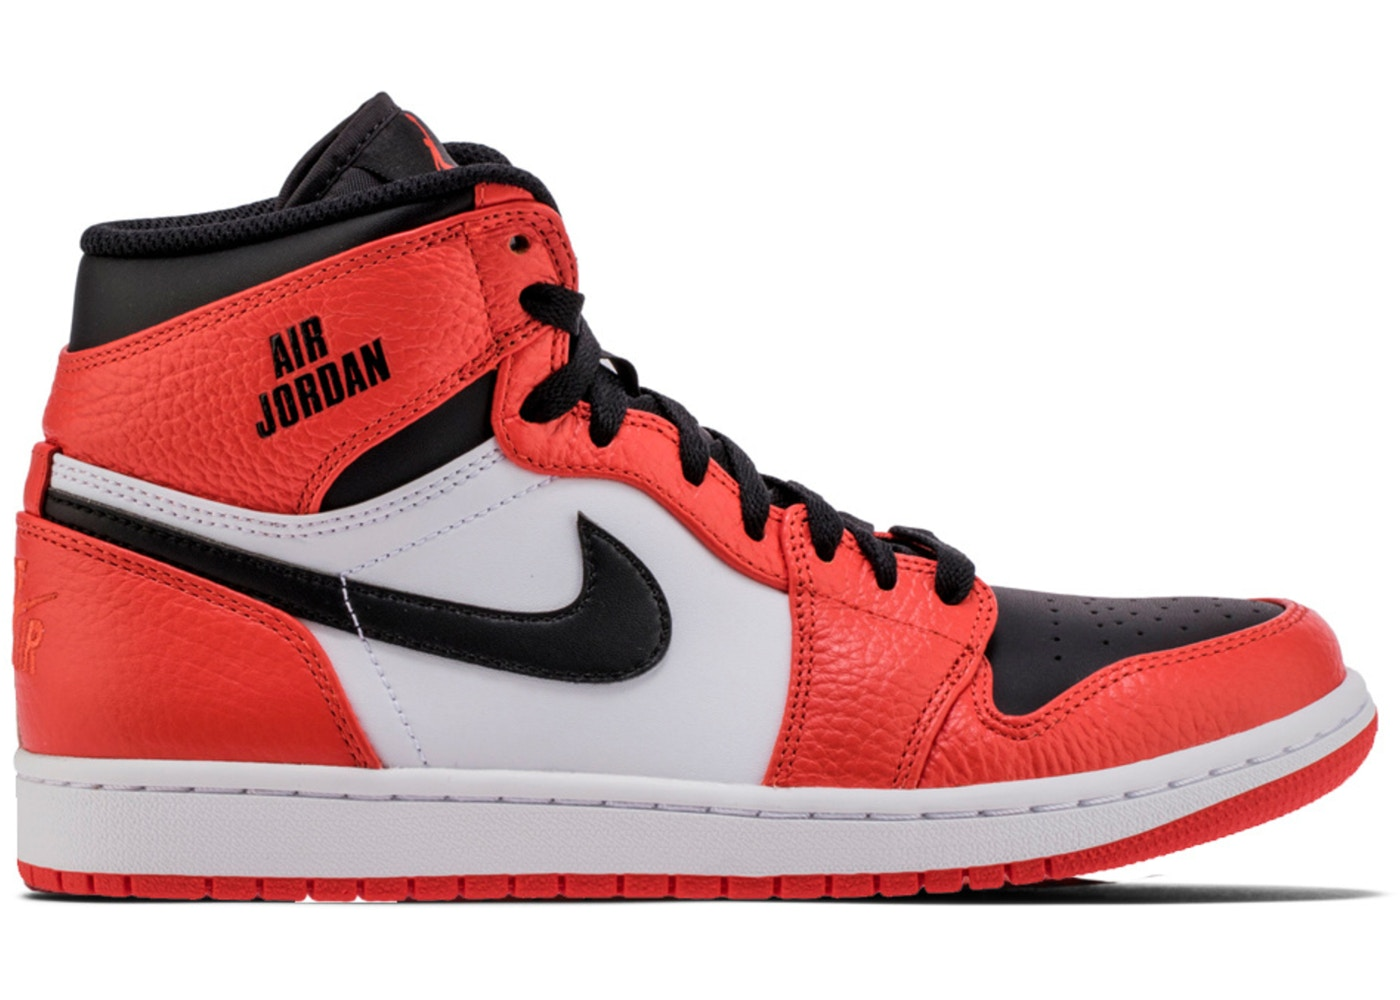 71aaeaa0363 Jordan 1 Retro Rare Air Max Orange - 332550-800